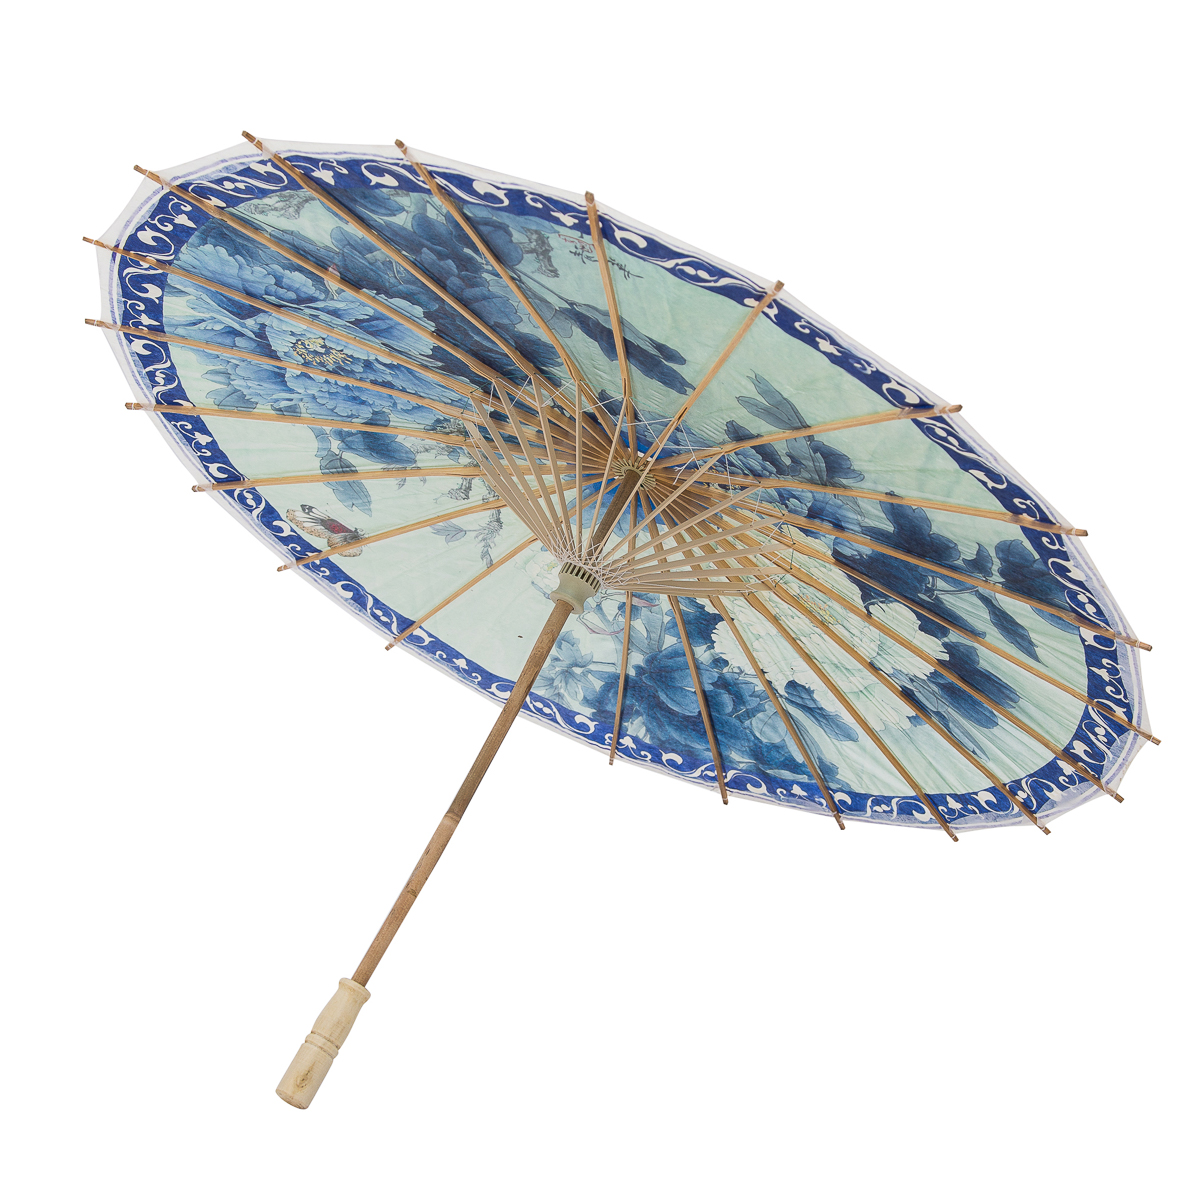 Rainproof Handmade Chinese Oiled Paper Umbrella Parasol 33 Blue White Flowers